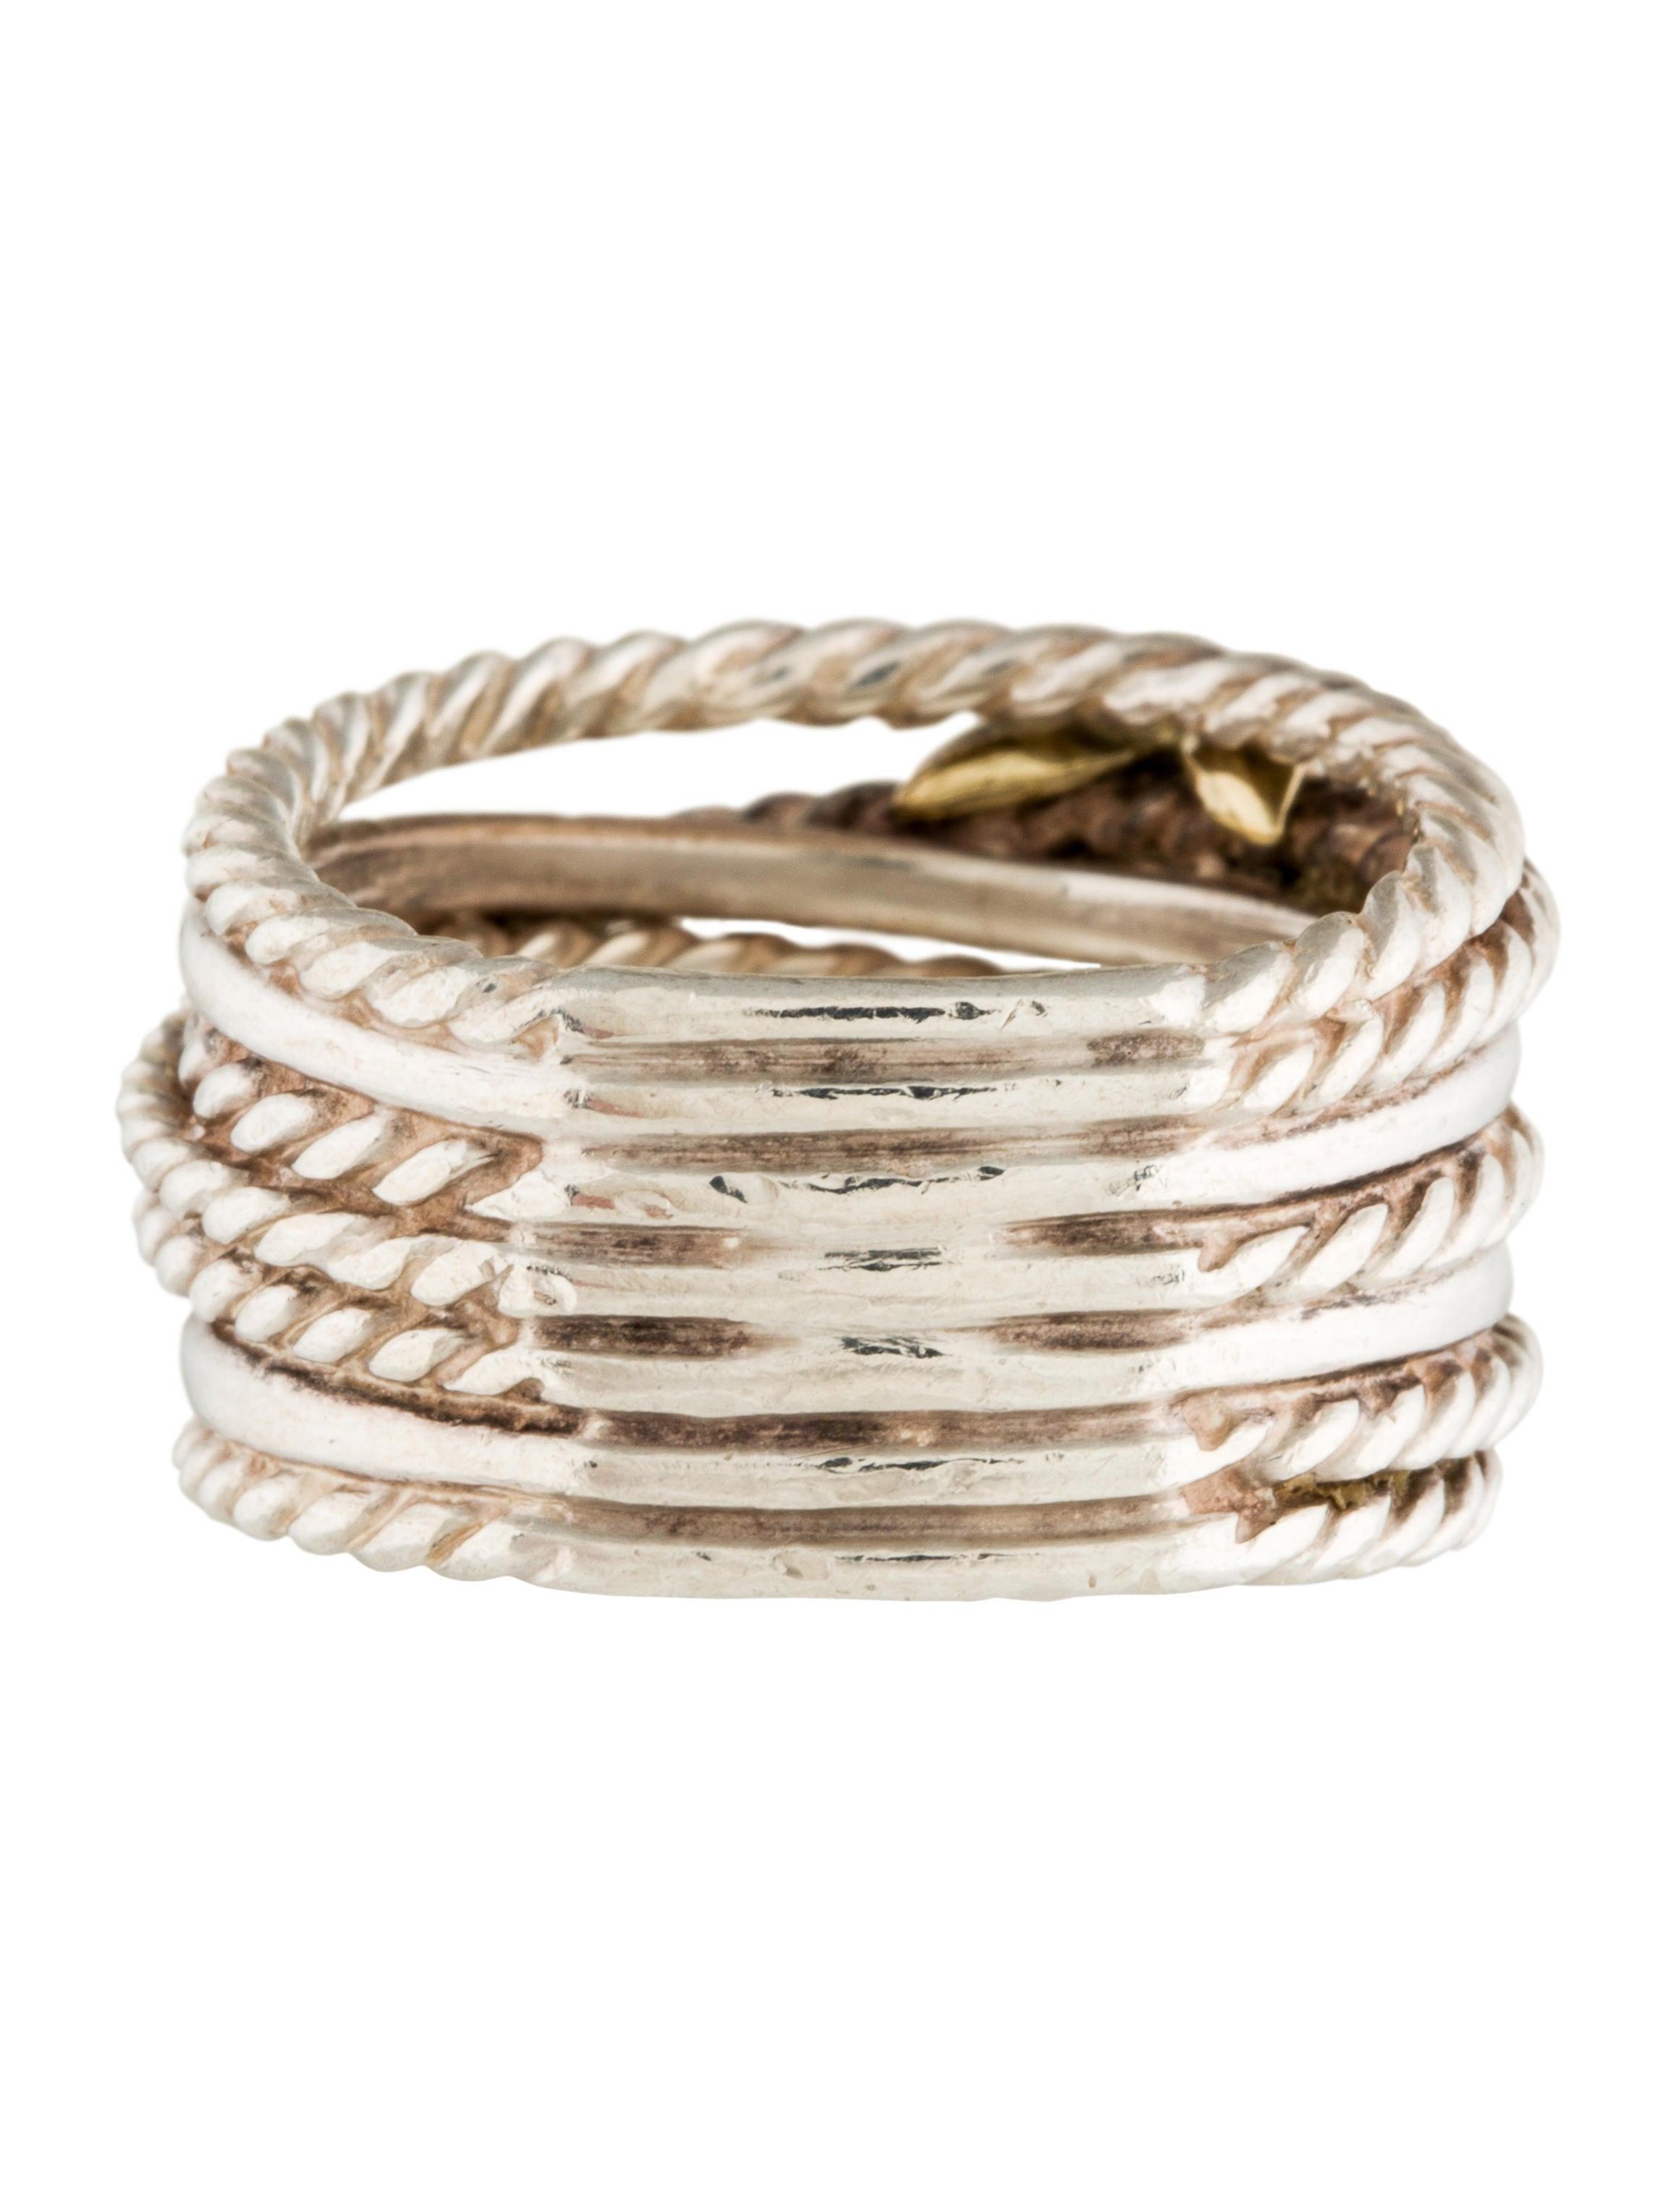 David yurman double x crossover ring rings dvy37547 for David yurman inspired jewelry rings